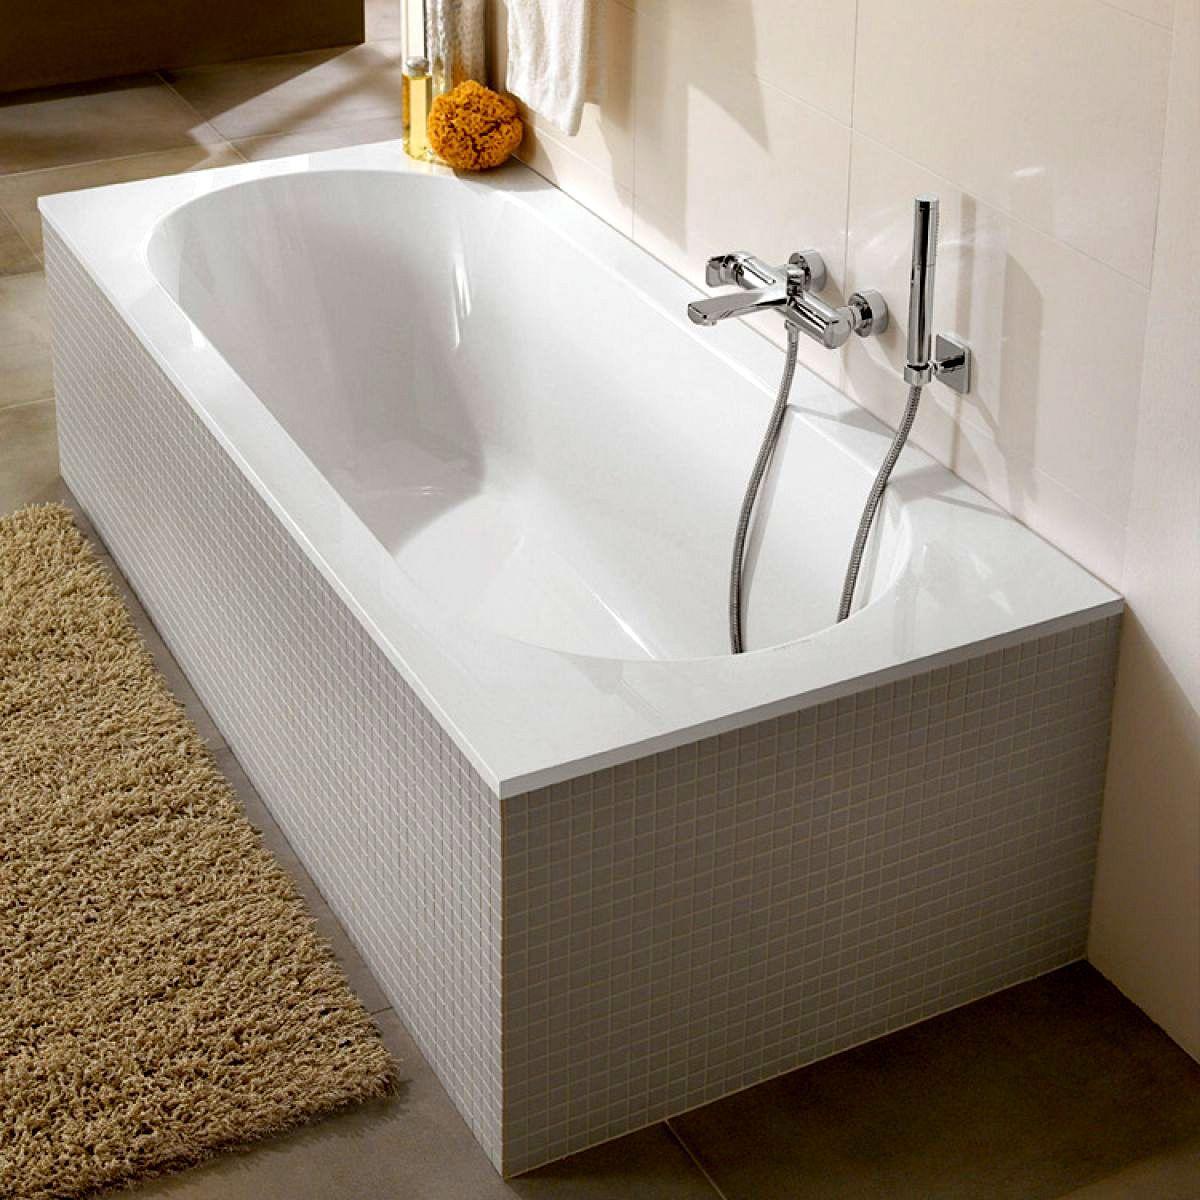 Villeroy & Boch Oberon(Soho) Bath